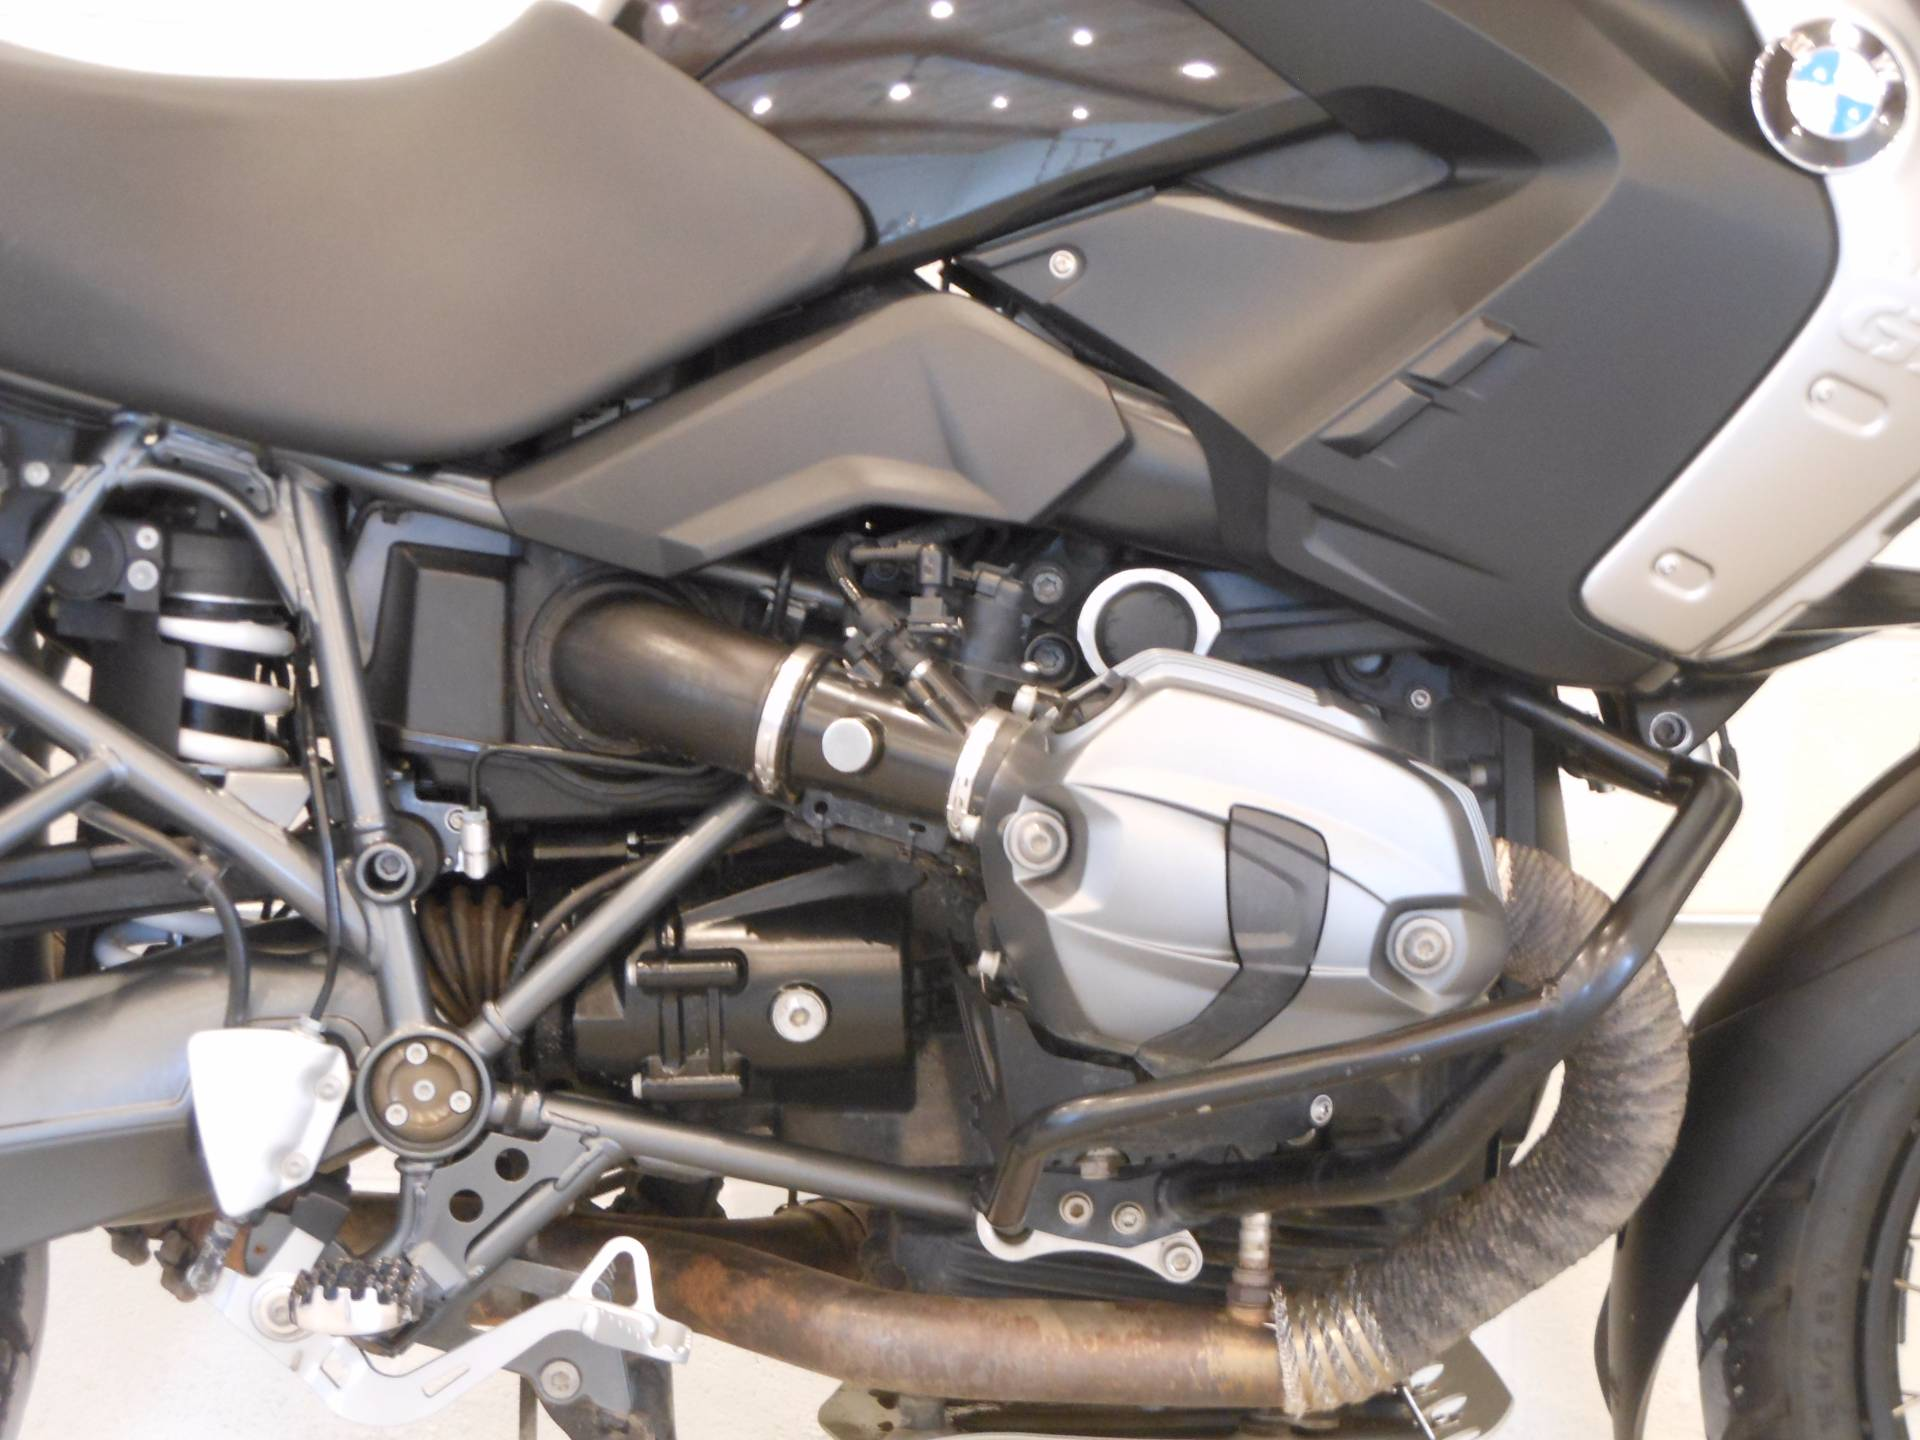 2012 BMW R 1200 GS in Port Clinton, Pennsylvania